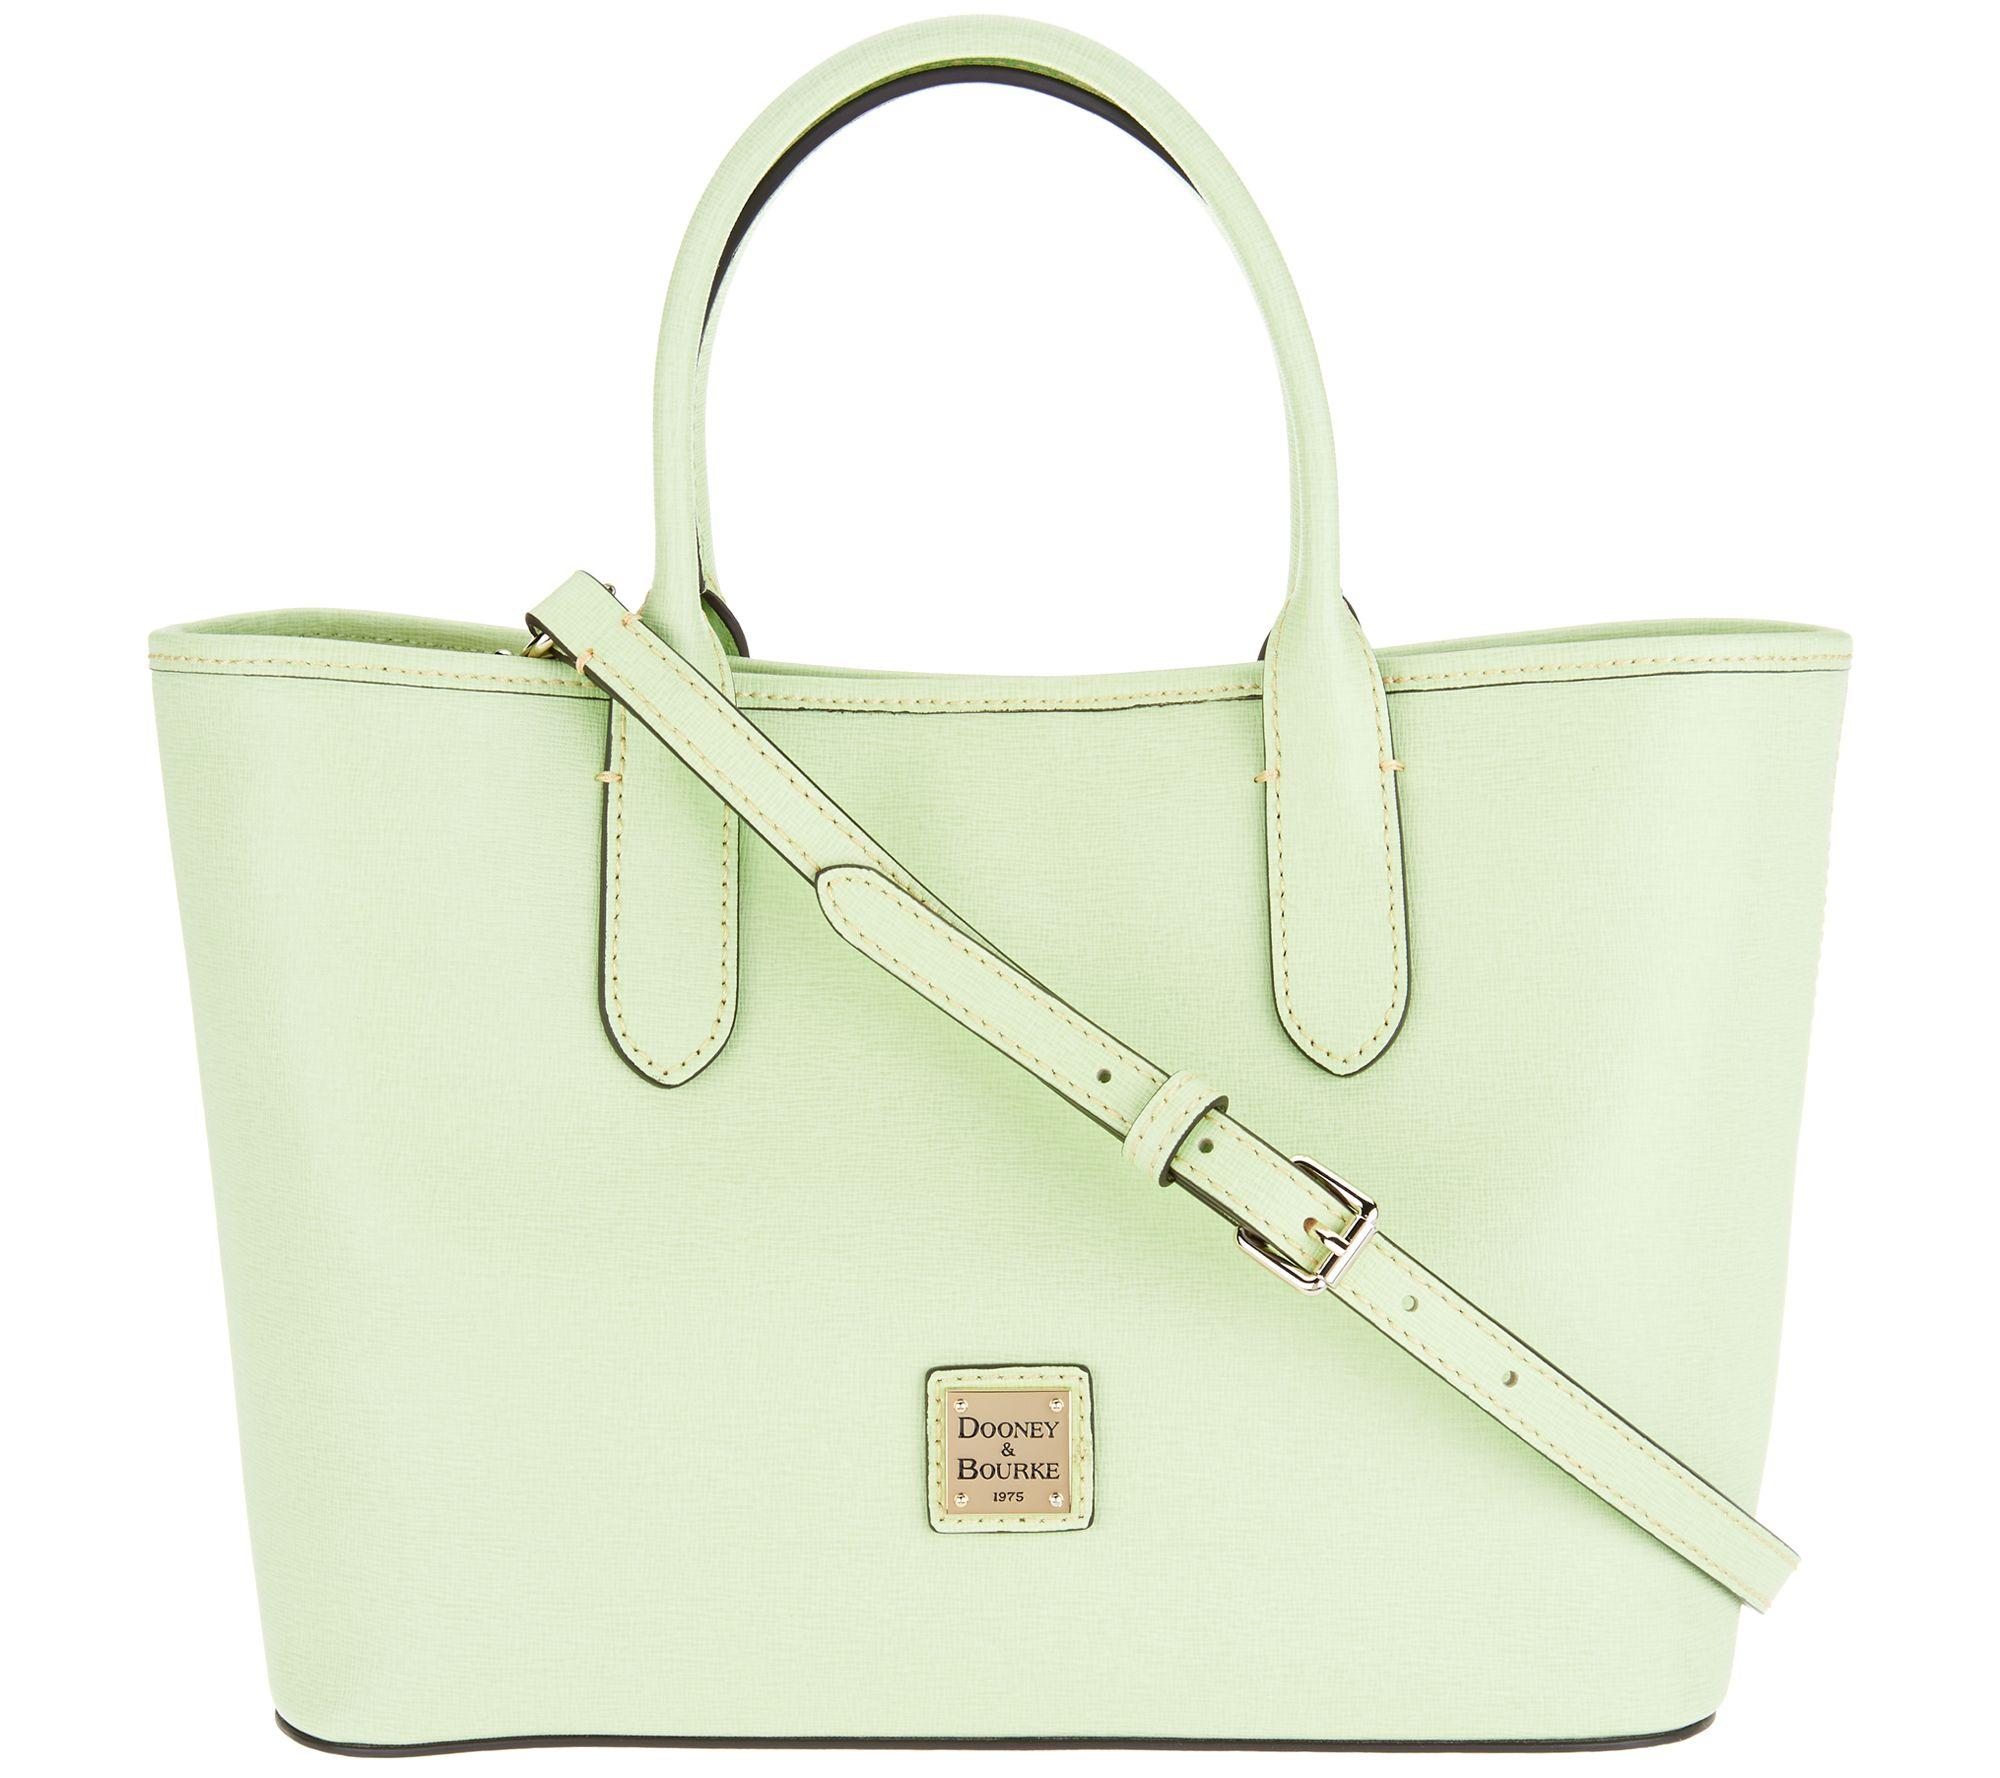 Dooney   Bourke Saffiano Leather Satchel Handbag -Brielle - Page 1 — QVC.com 5e219af22cfdf